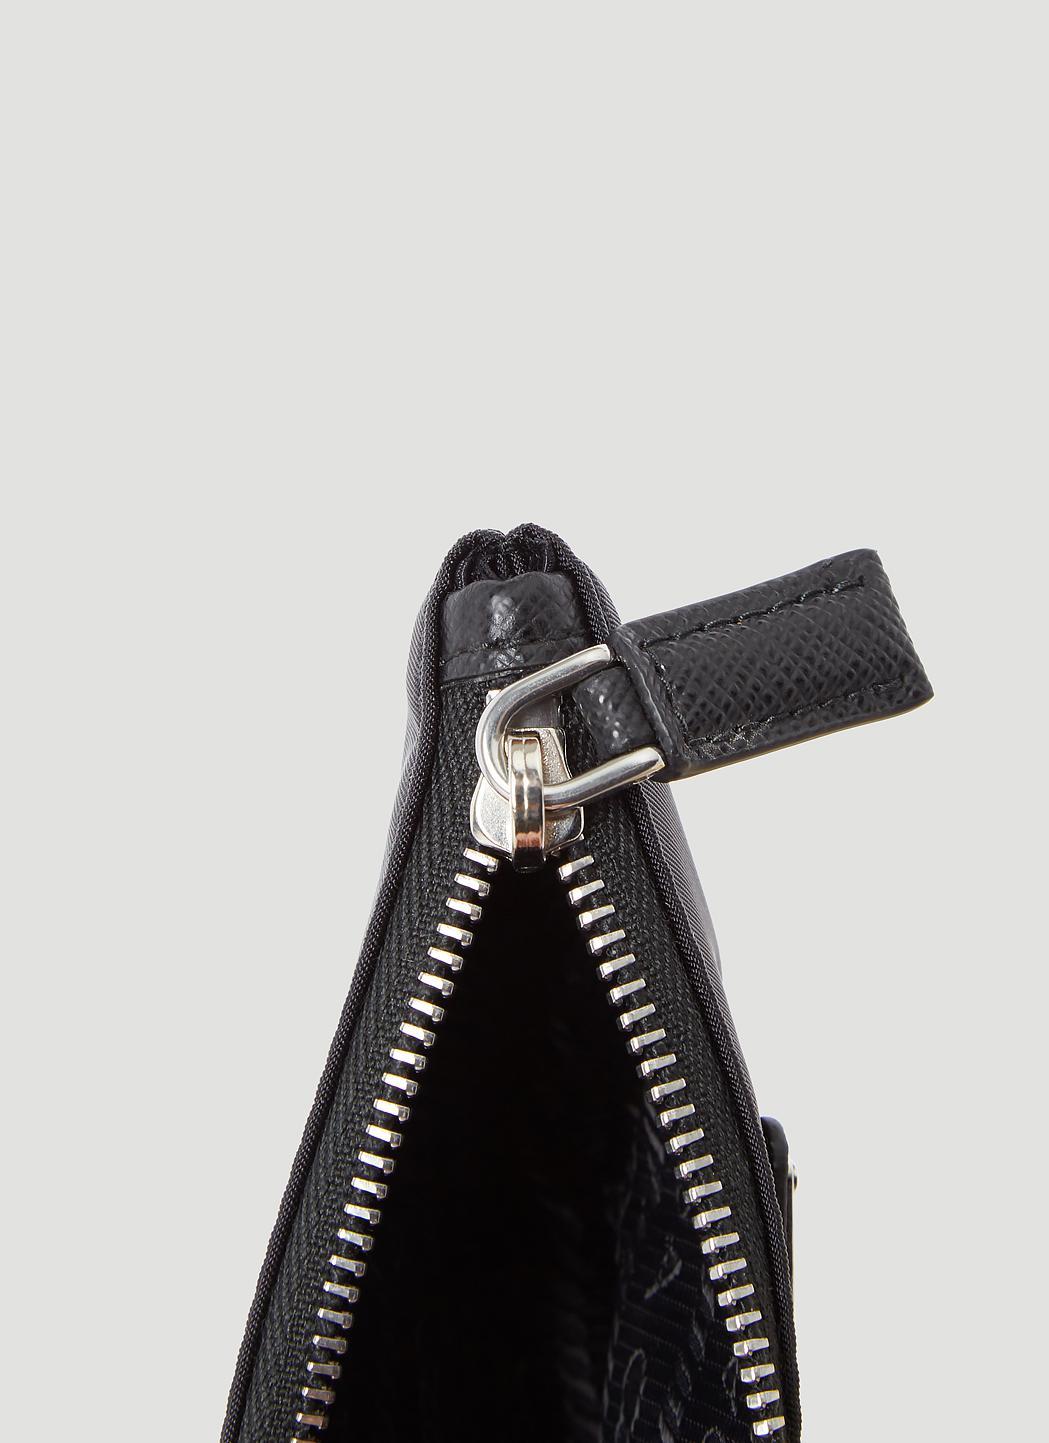 ... bag aa946 e73c0  new zealand prada nylon key chain wallet in black for  men lyst 9486e b57b1 9fd1c29a76298